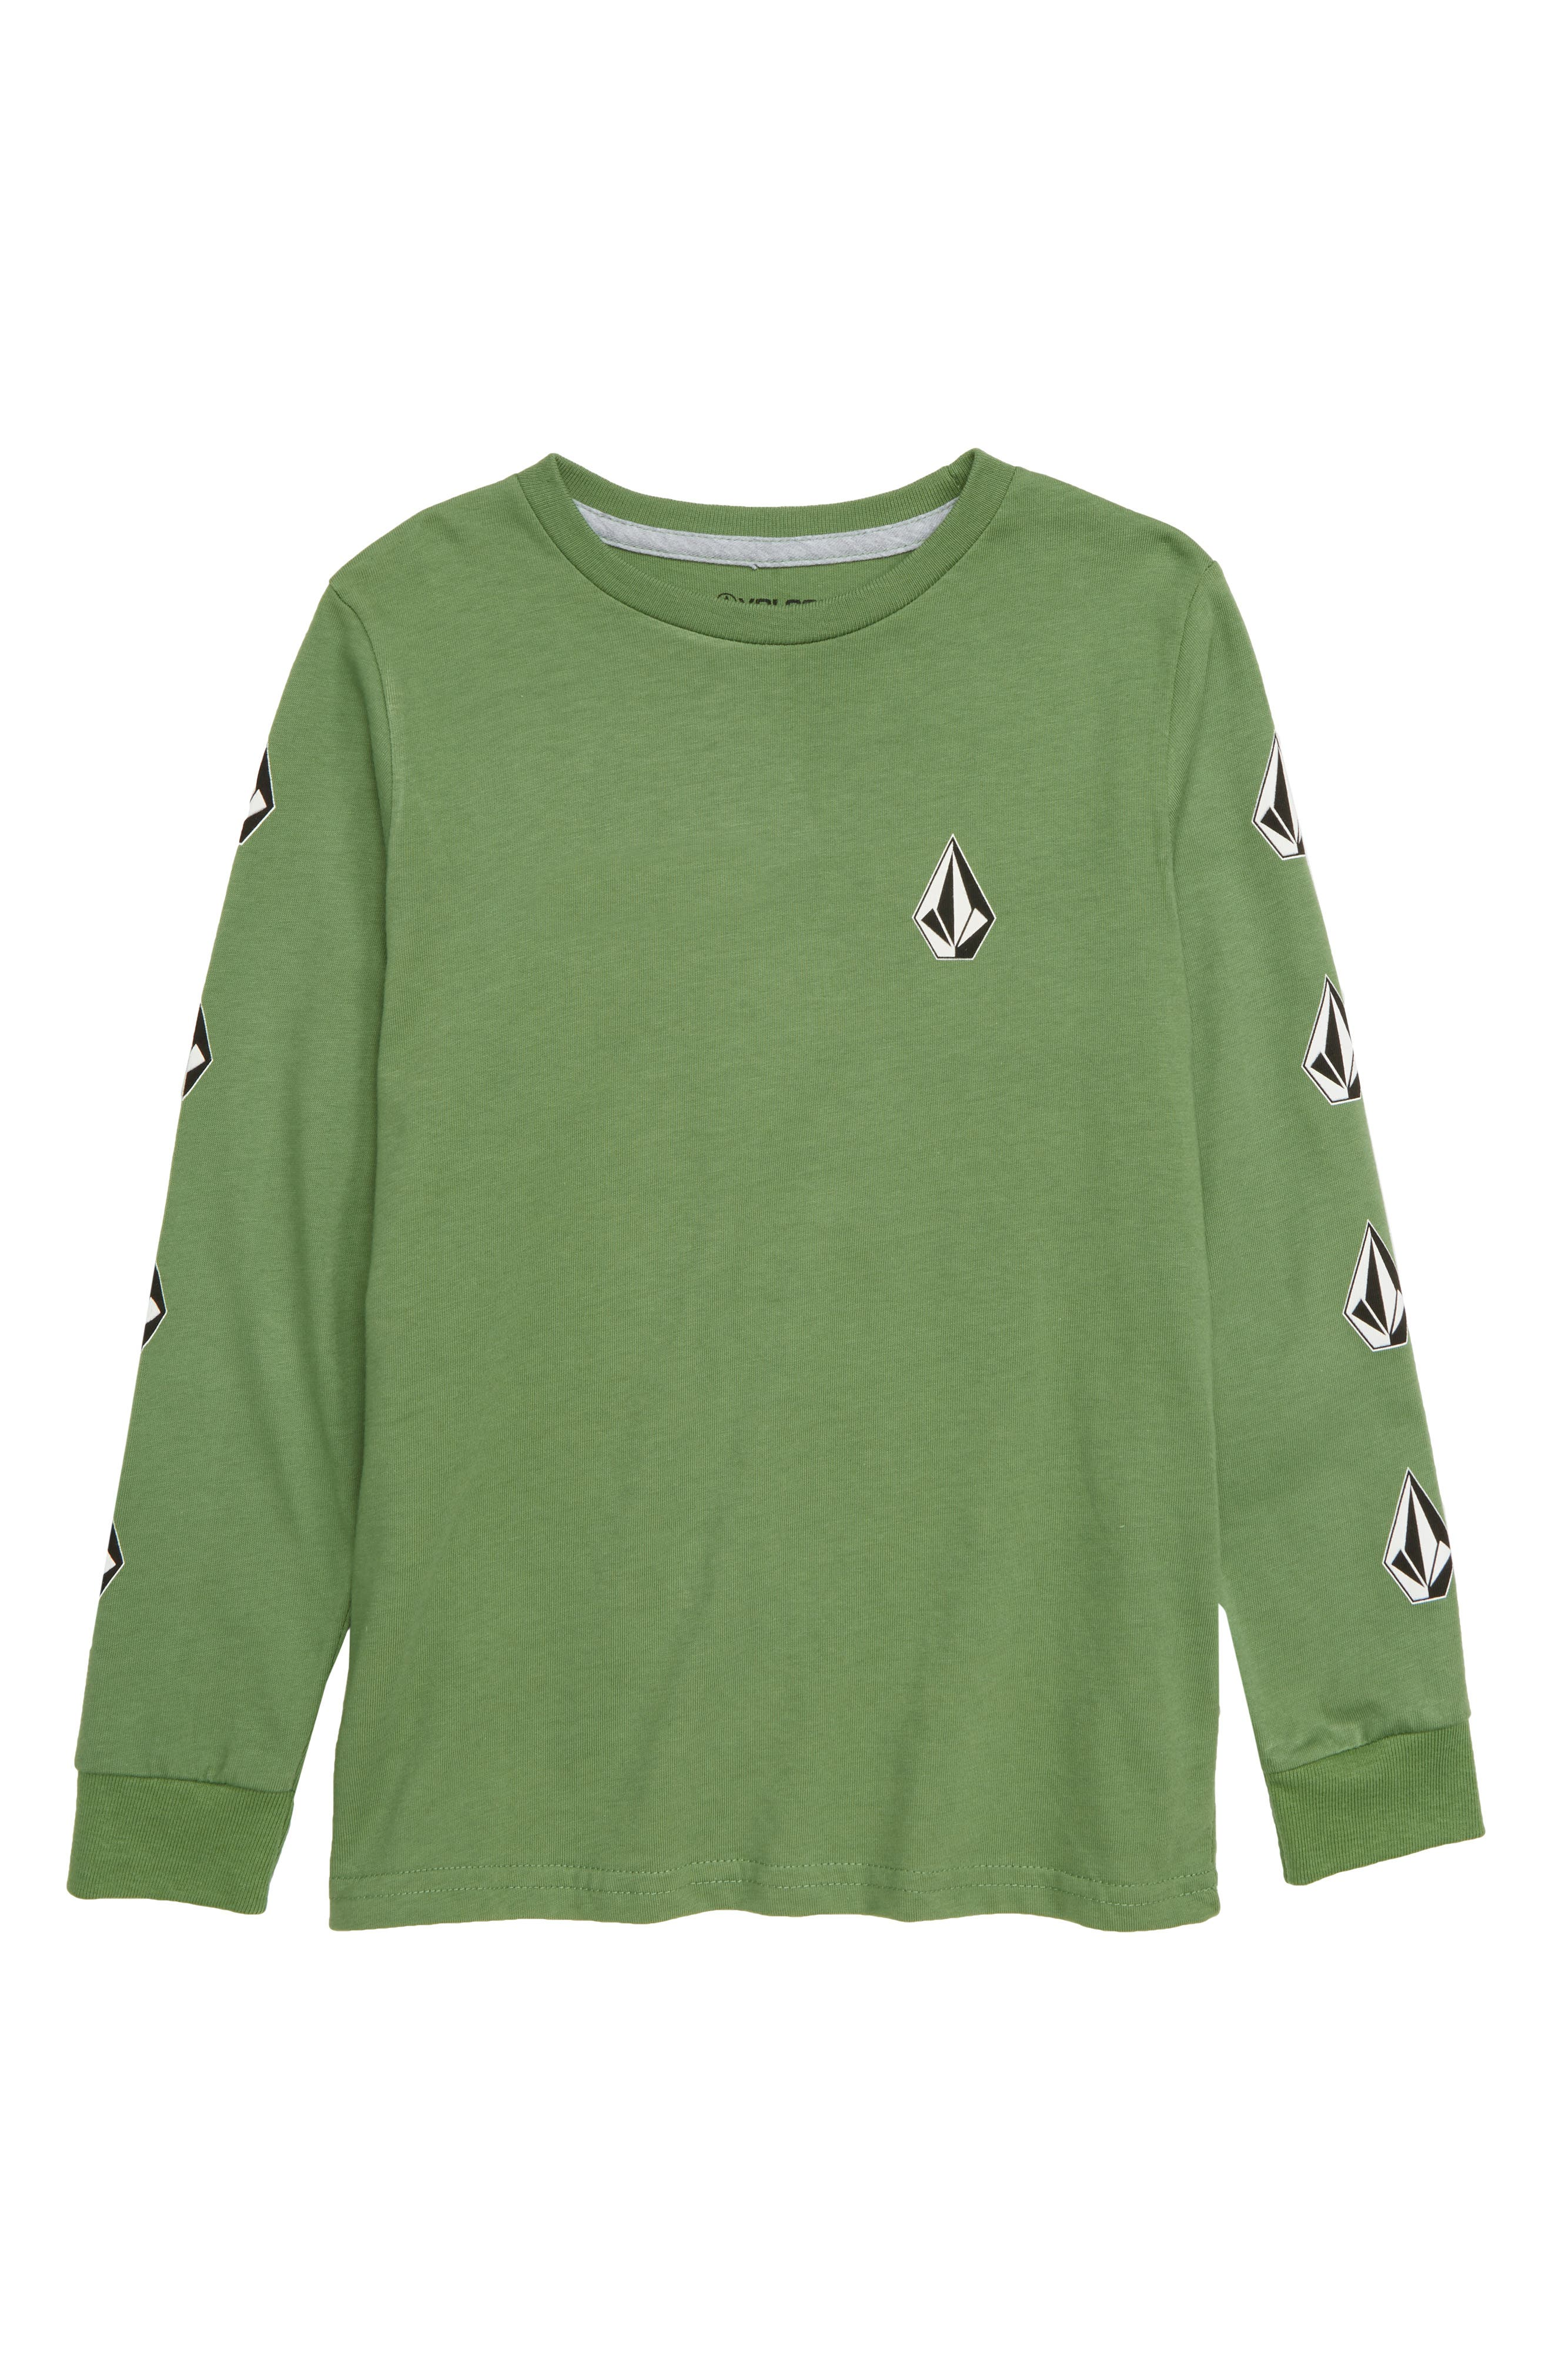 Deadlystones Graphic Long Sleeve T-Shirt,                         Main,                         color, DARK KELLY